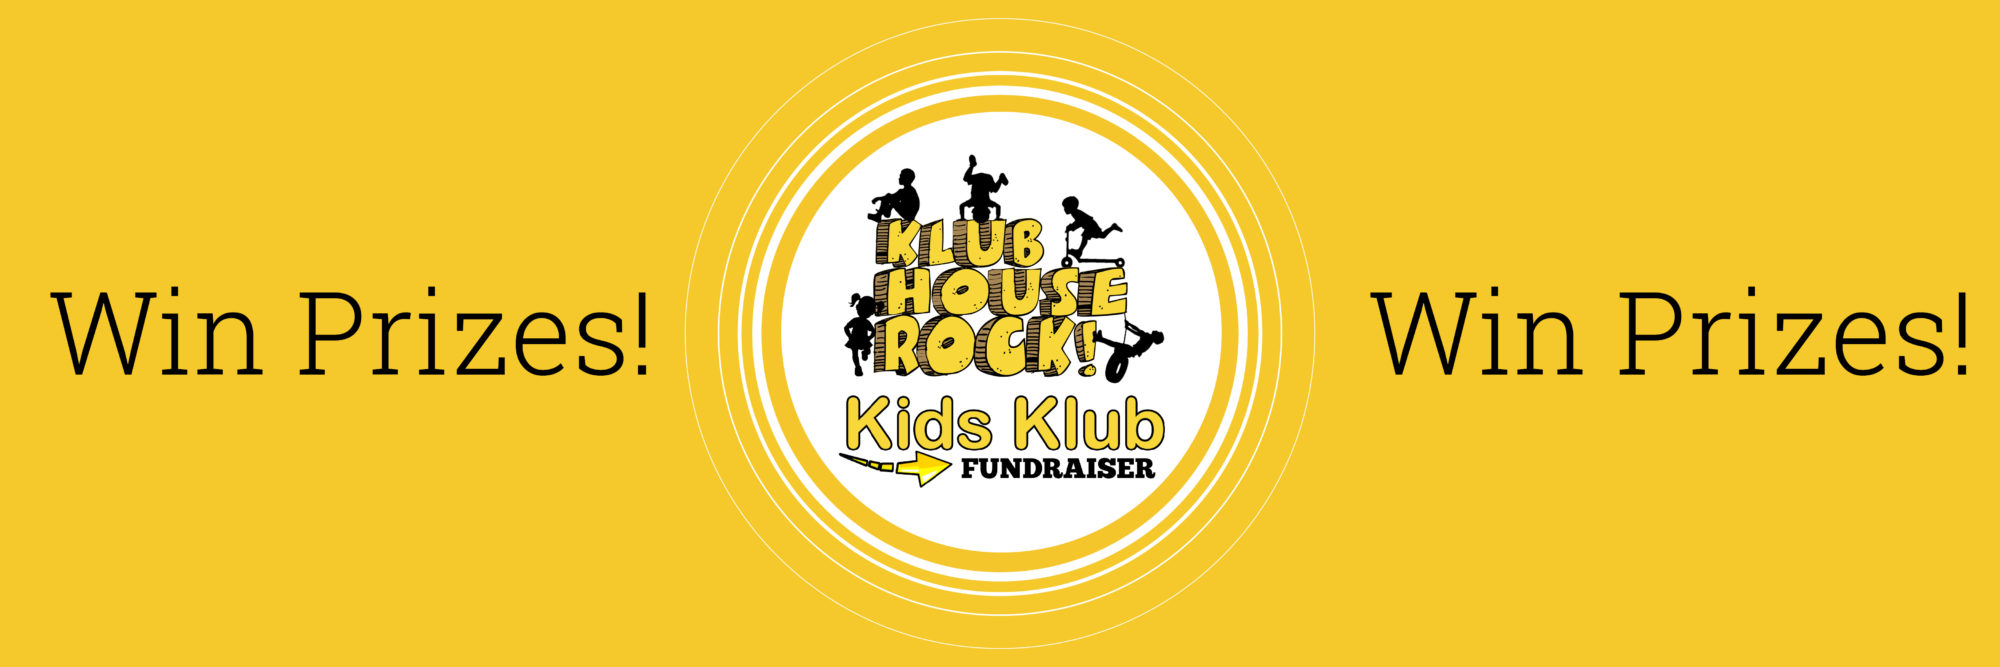 Klub House Rock! fundraiser – raffles & silent auctions